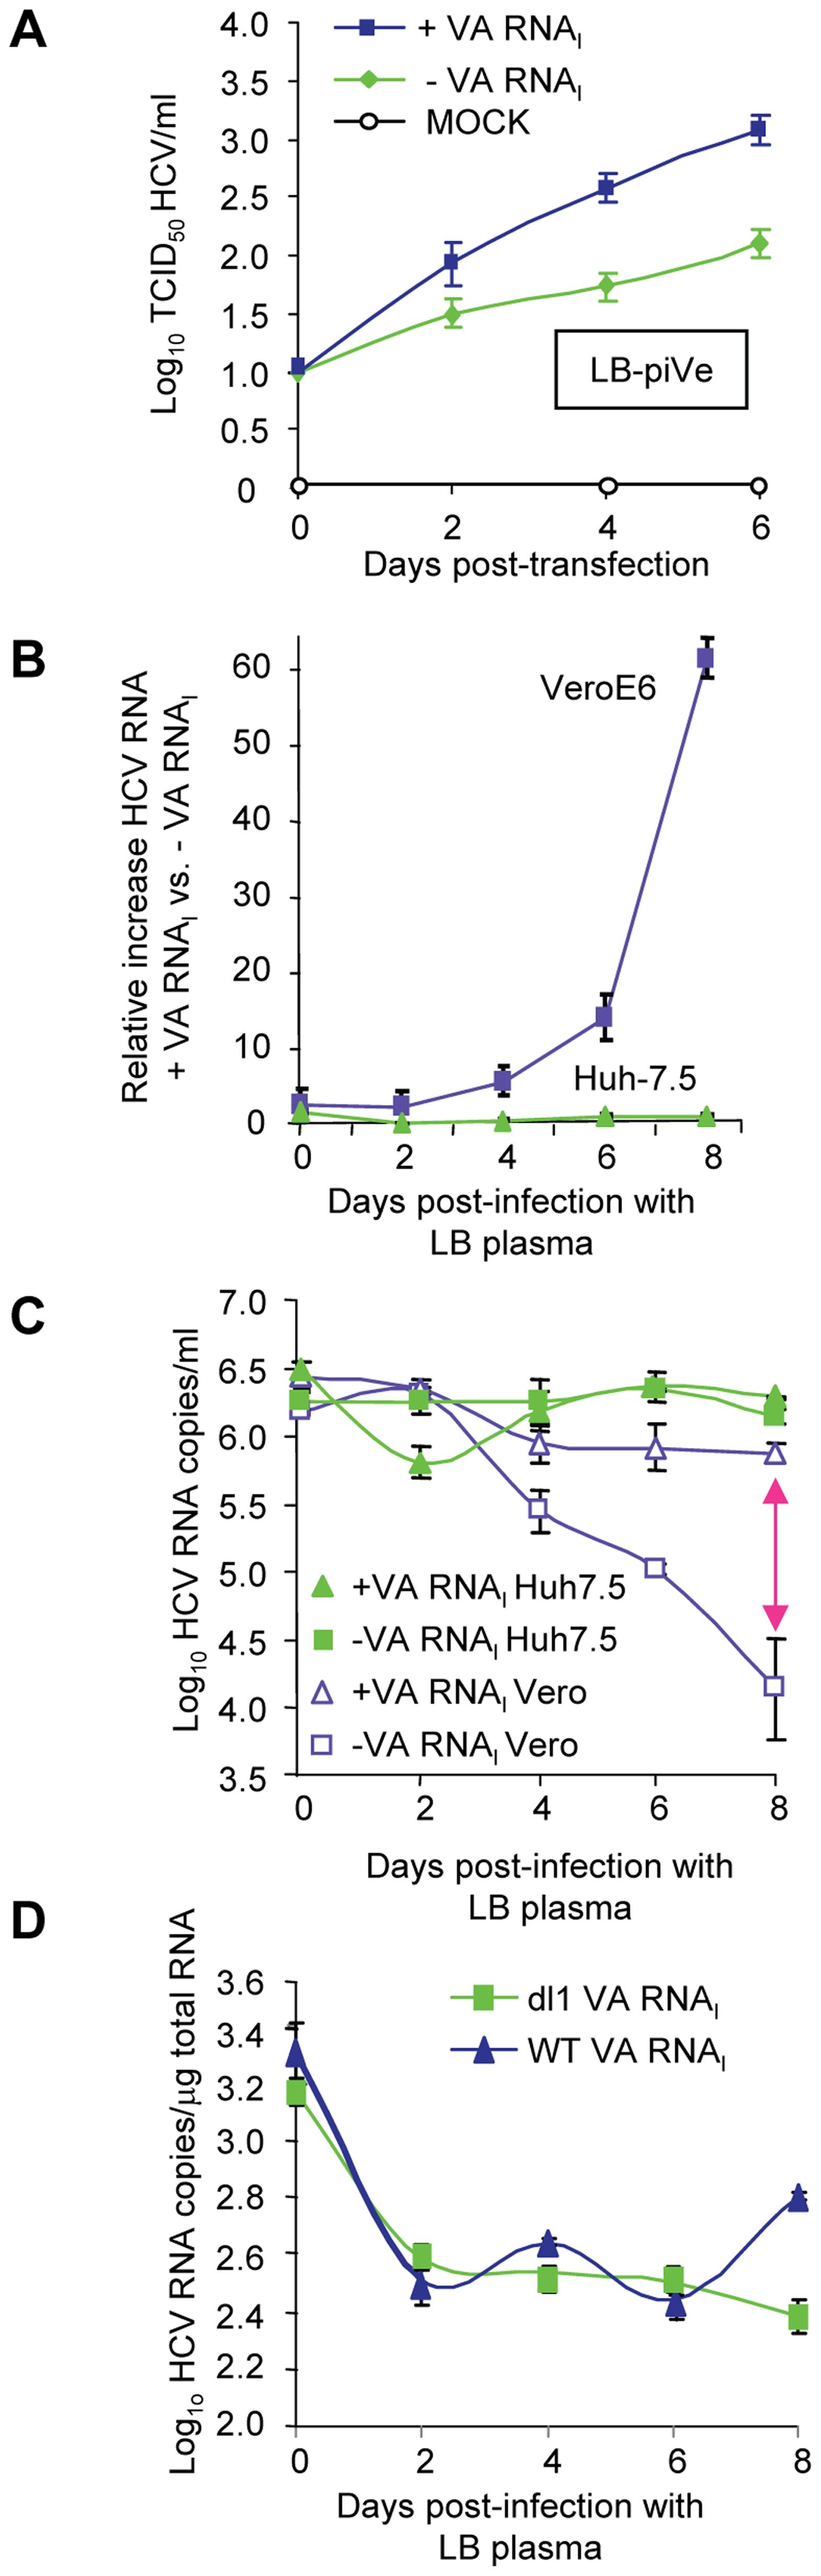 VA RNA<sub>I</sub> stimulates replication of HCV and increases RNA stability.